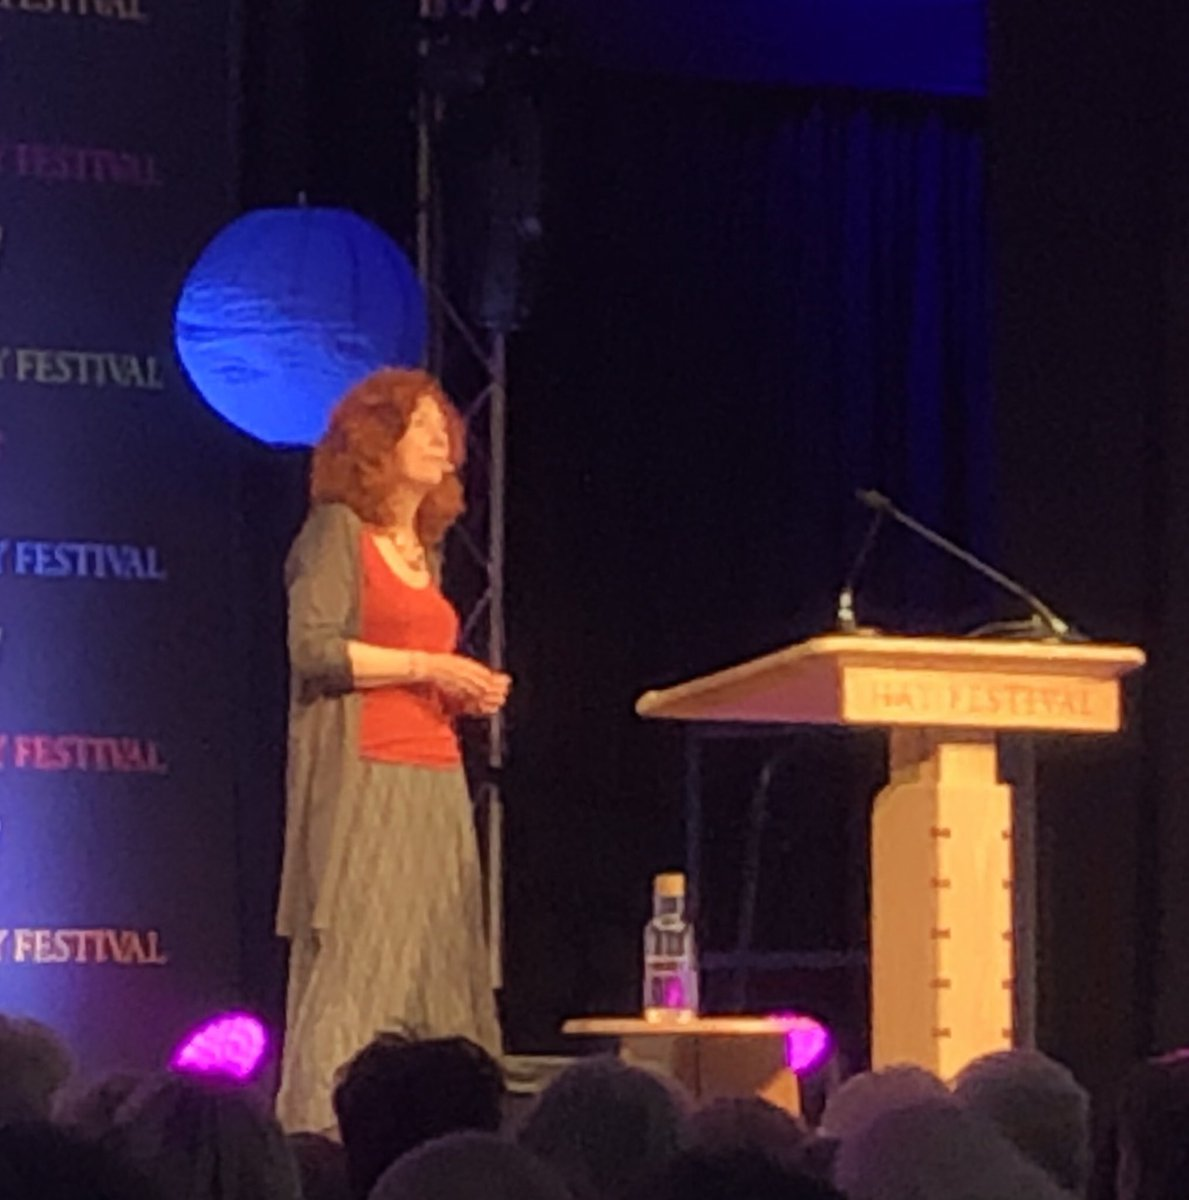 2019-05-30 Hay Literary Festival Angie Hobbs talk 1.jpg